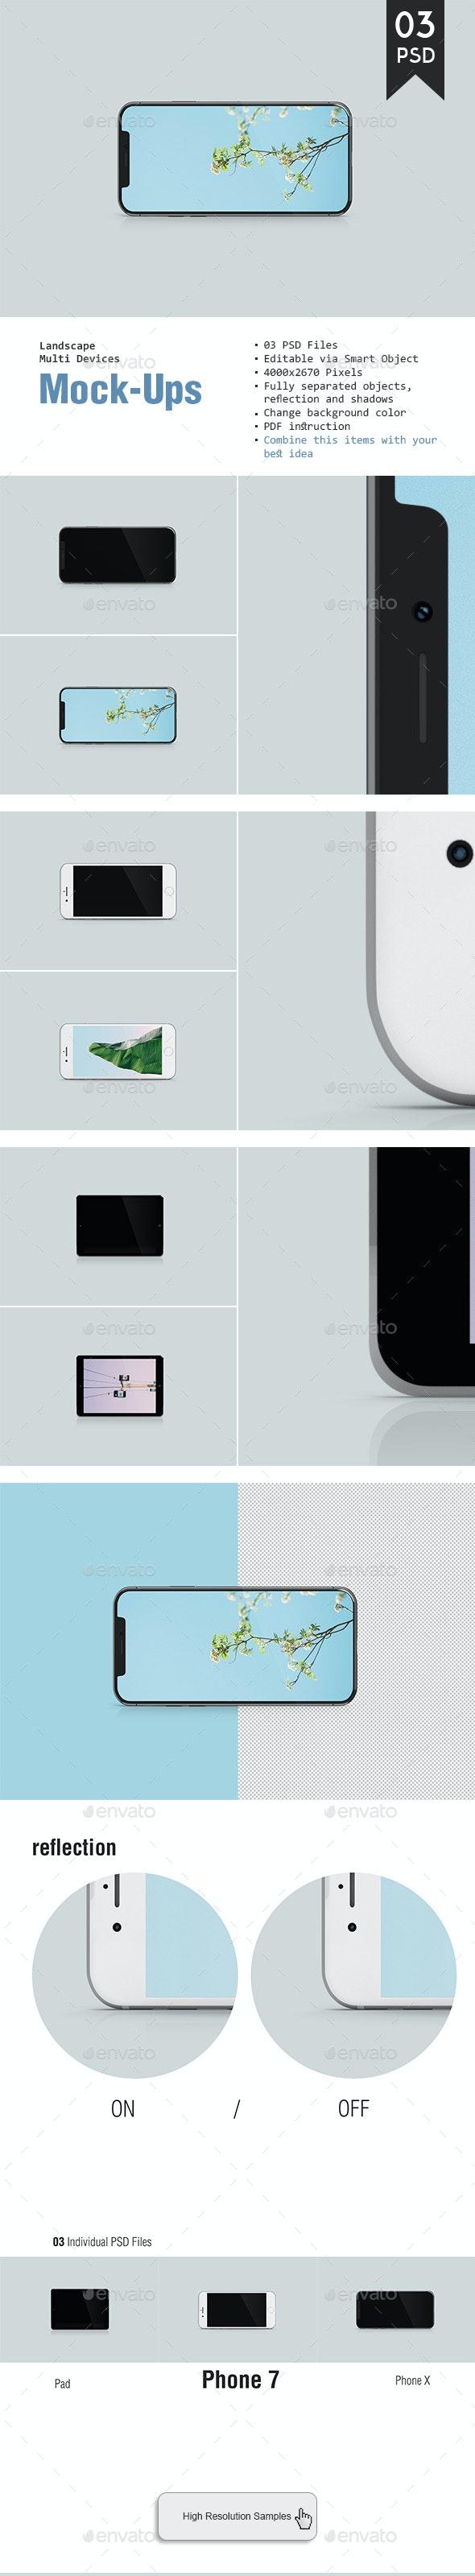 Landscape Multi Devices Mockup - Displays Product Mock-Ups